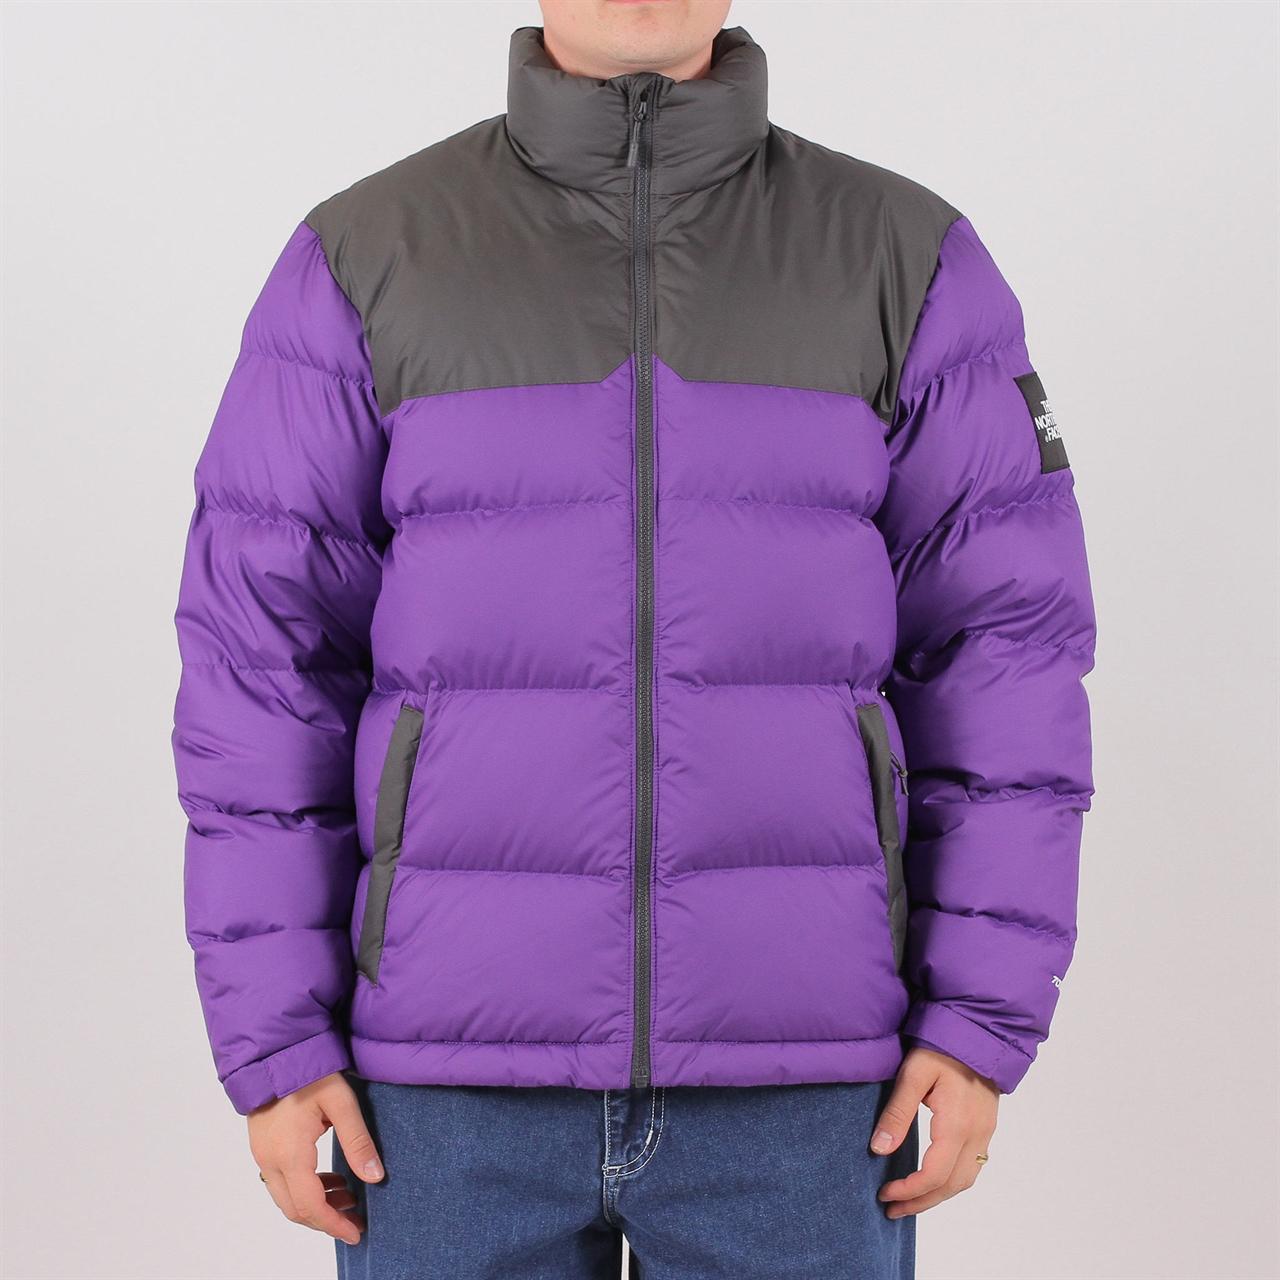 Shelta - The North Face 1992 Nuptse Jacket (T92ZWE6LK) c9c73d2be